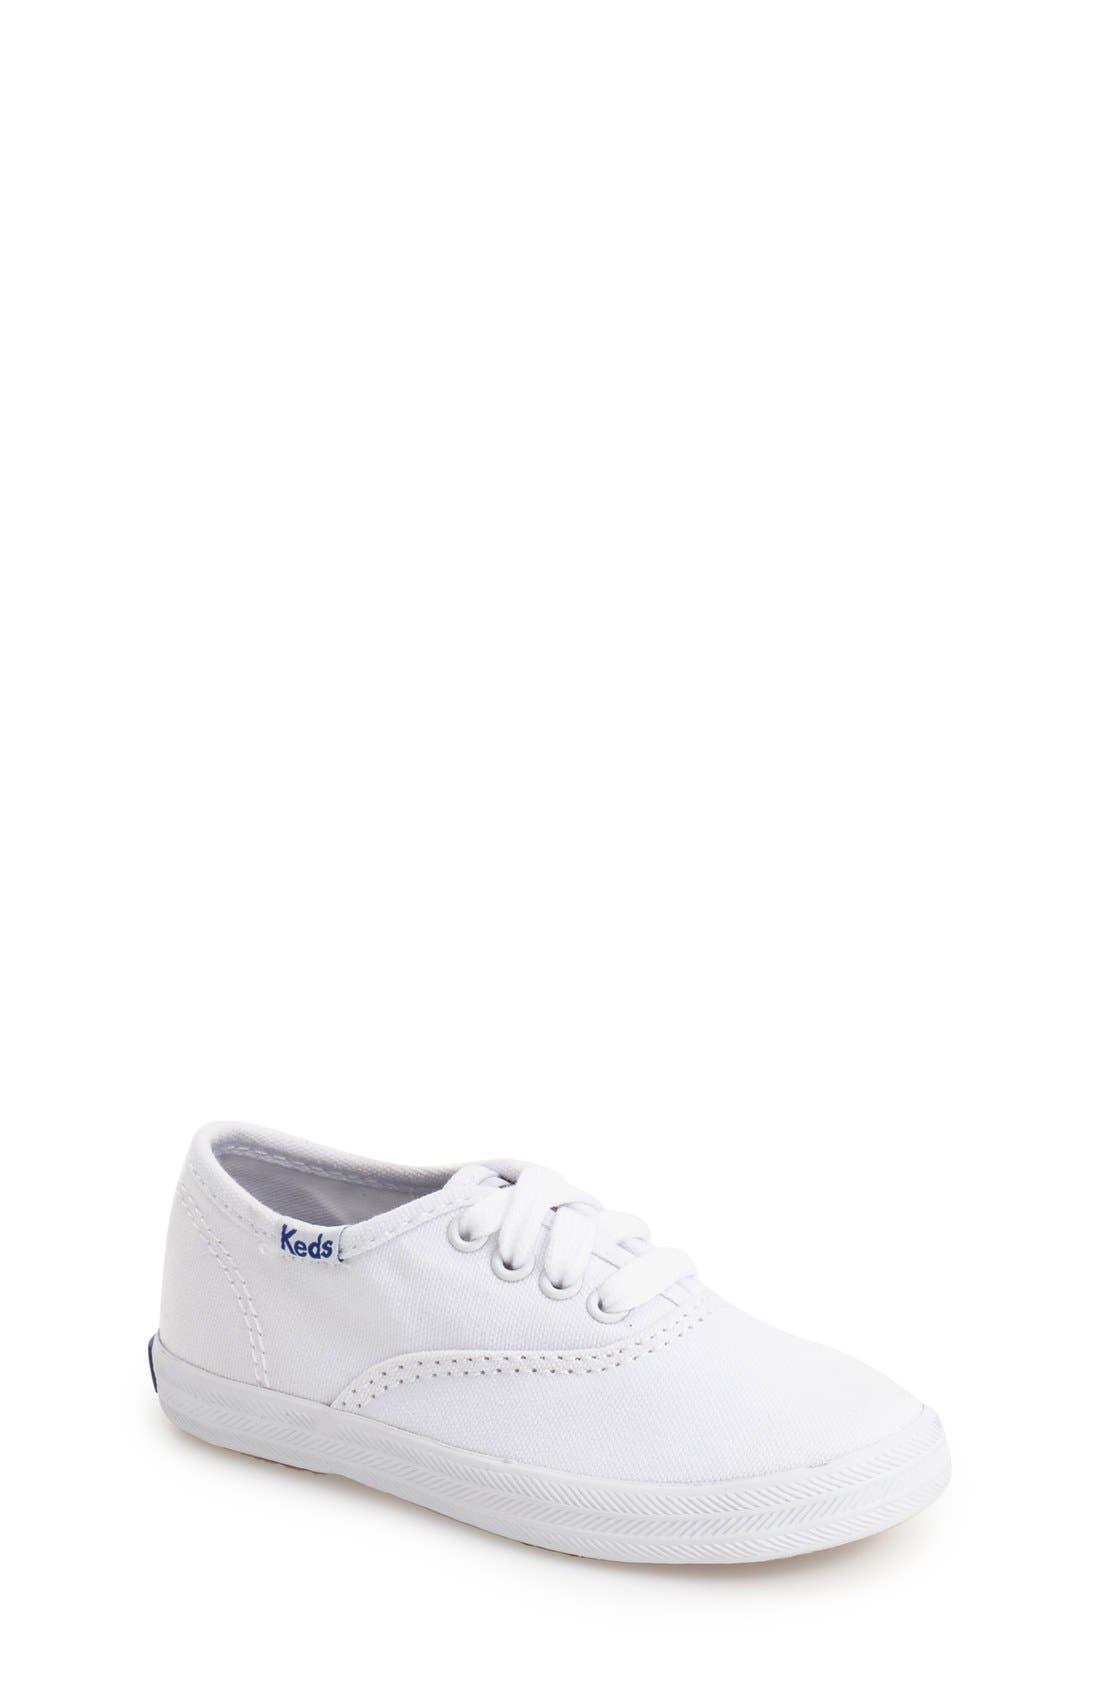 Alternate Image 1 Selected - Keds® 'Champion Canvas' Sneaker (Walker & Toddler)